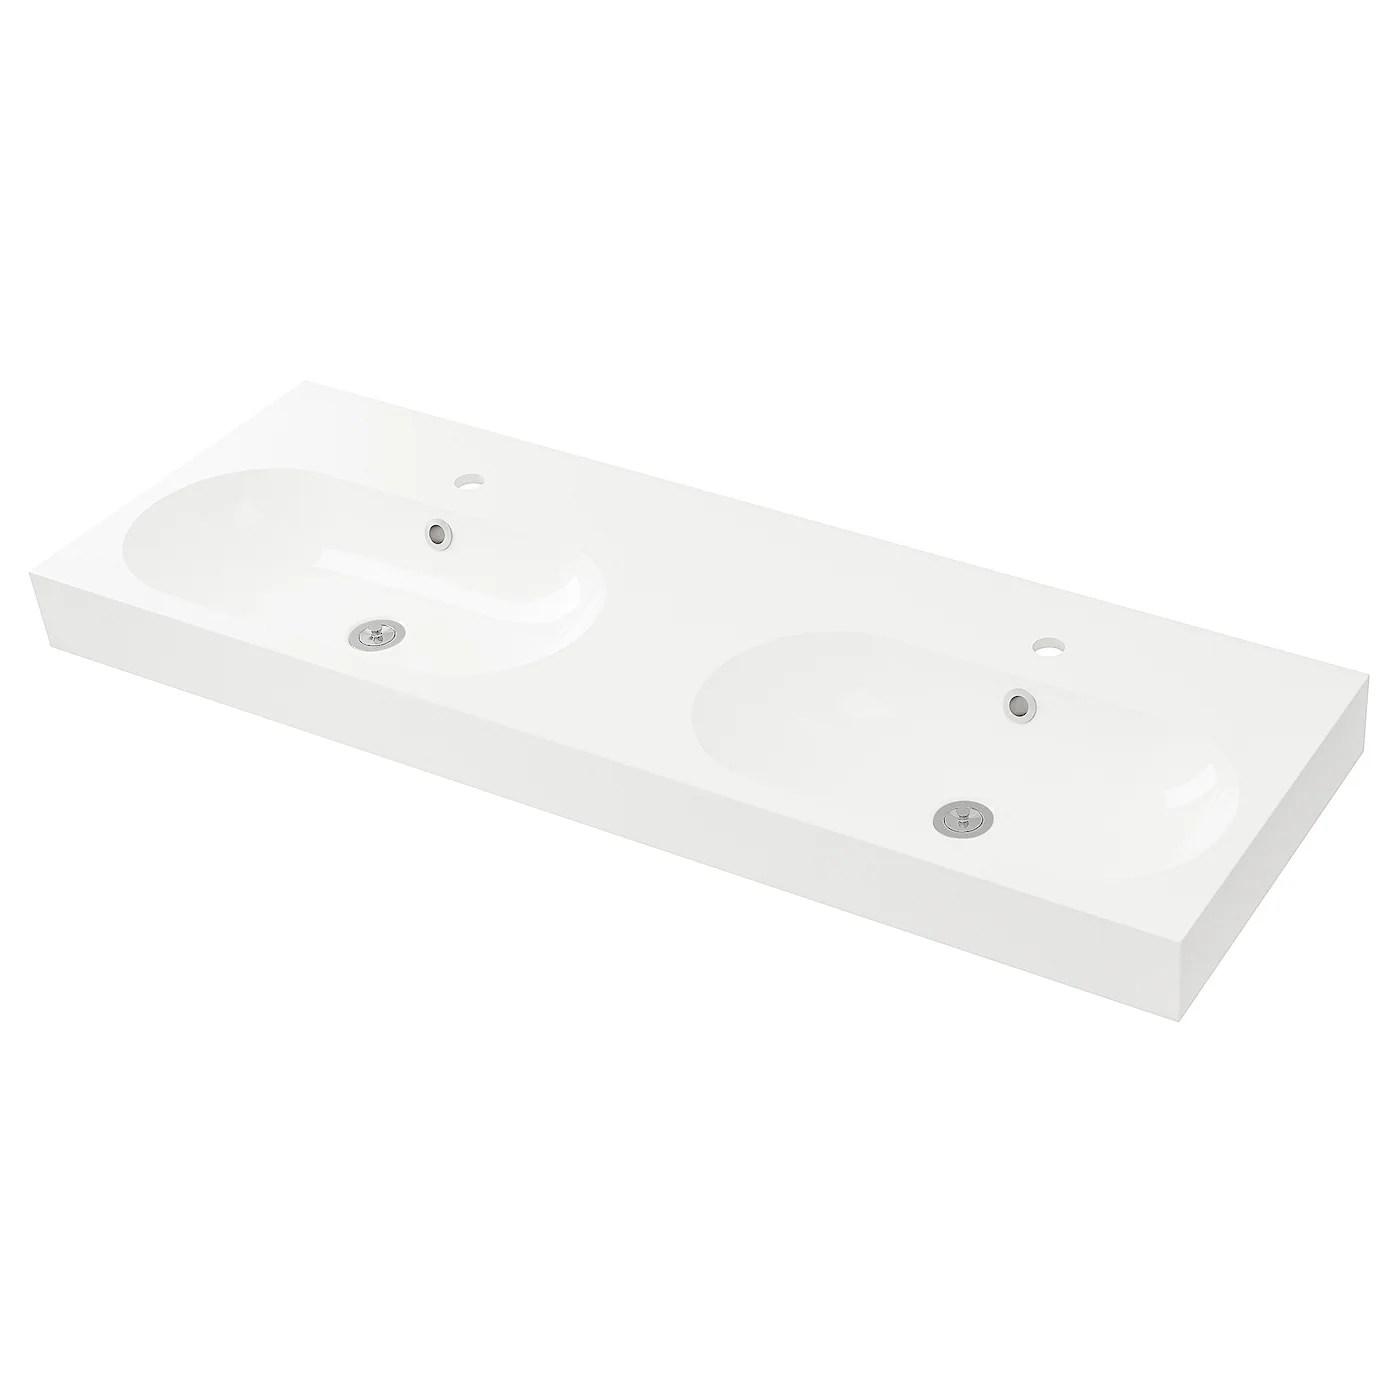 Braviken Double Vasque Blanc 140x48x10 Cm Ikea